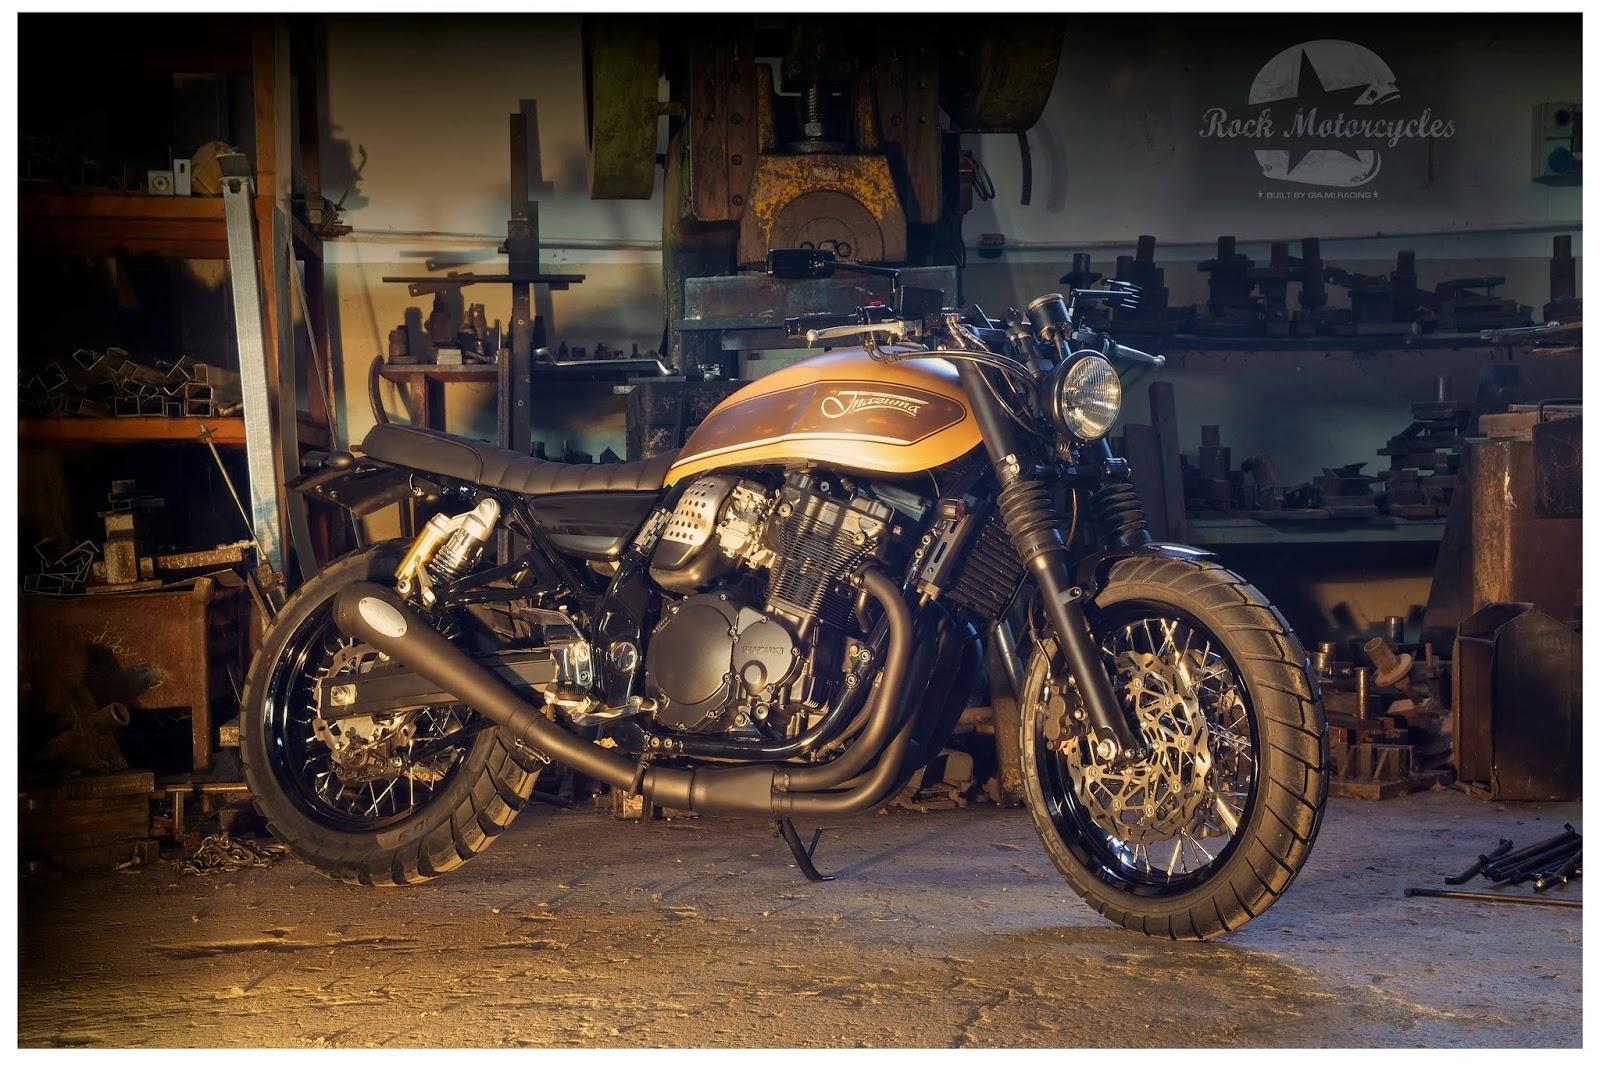 Inazuma 750 Scrambler by Gia Mi Motorcycles